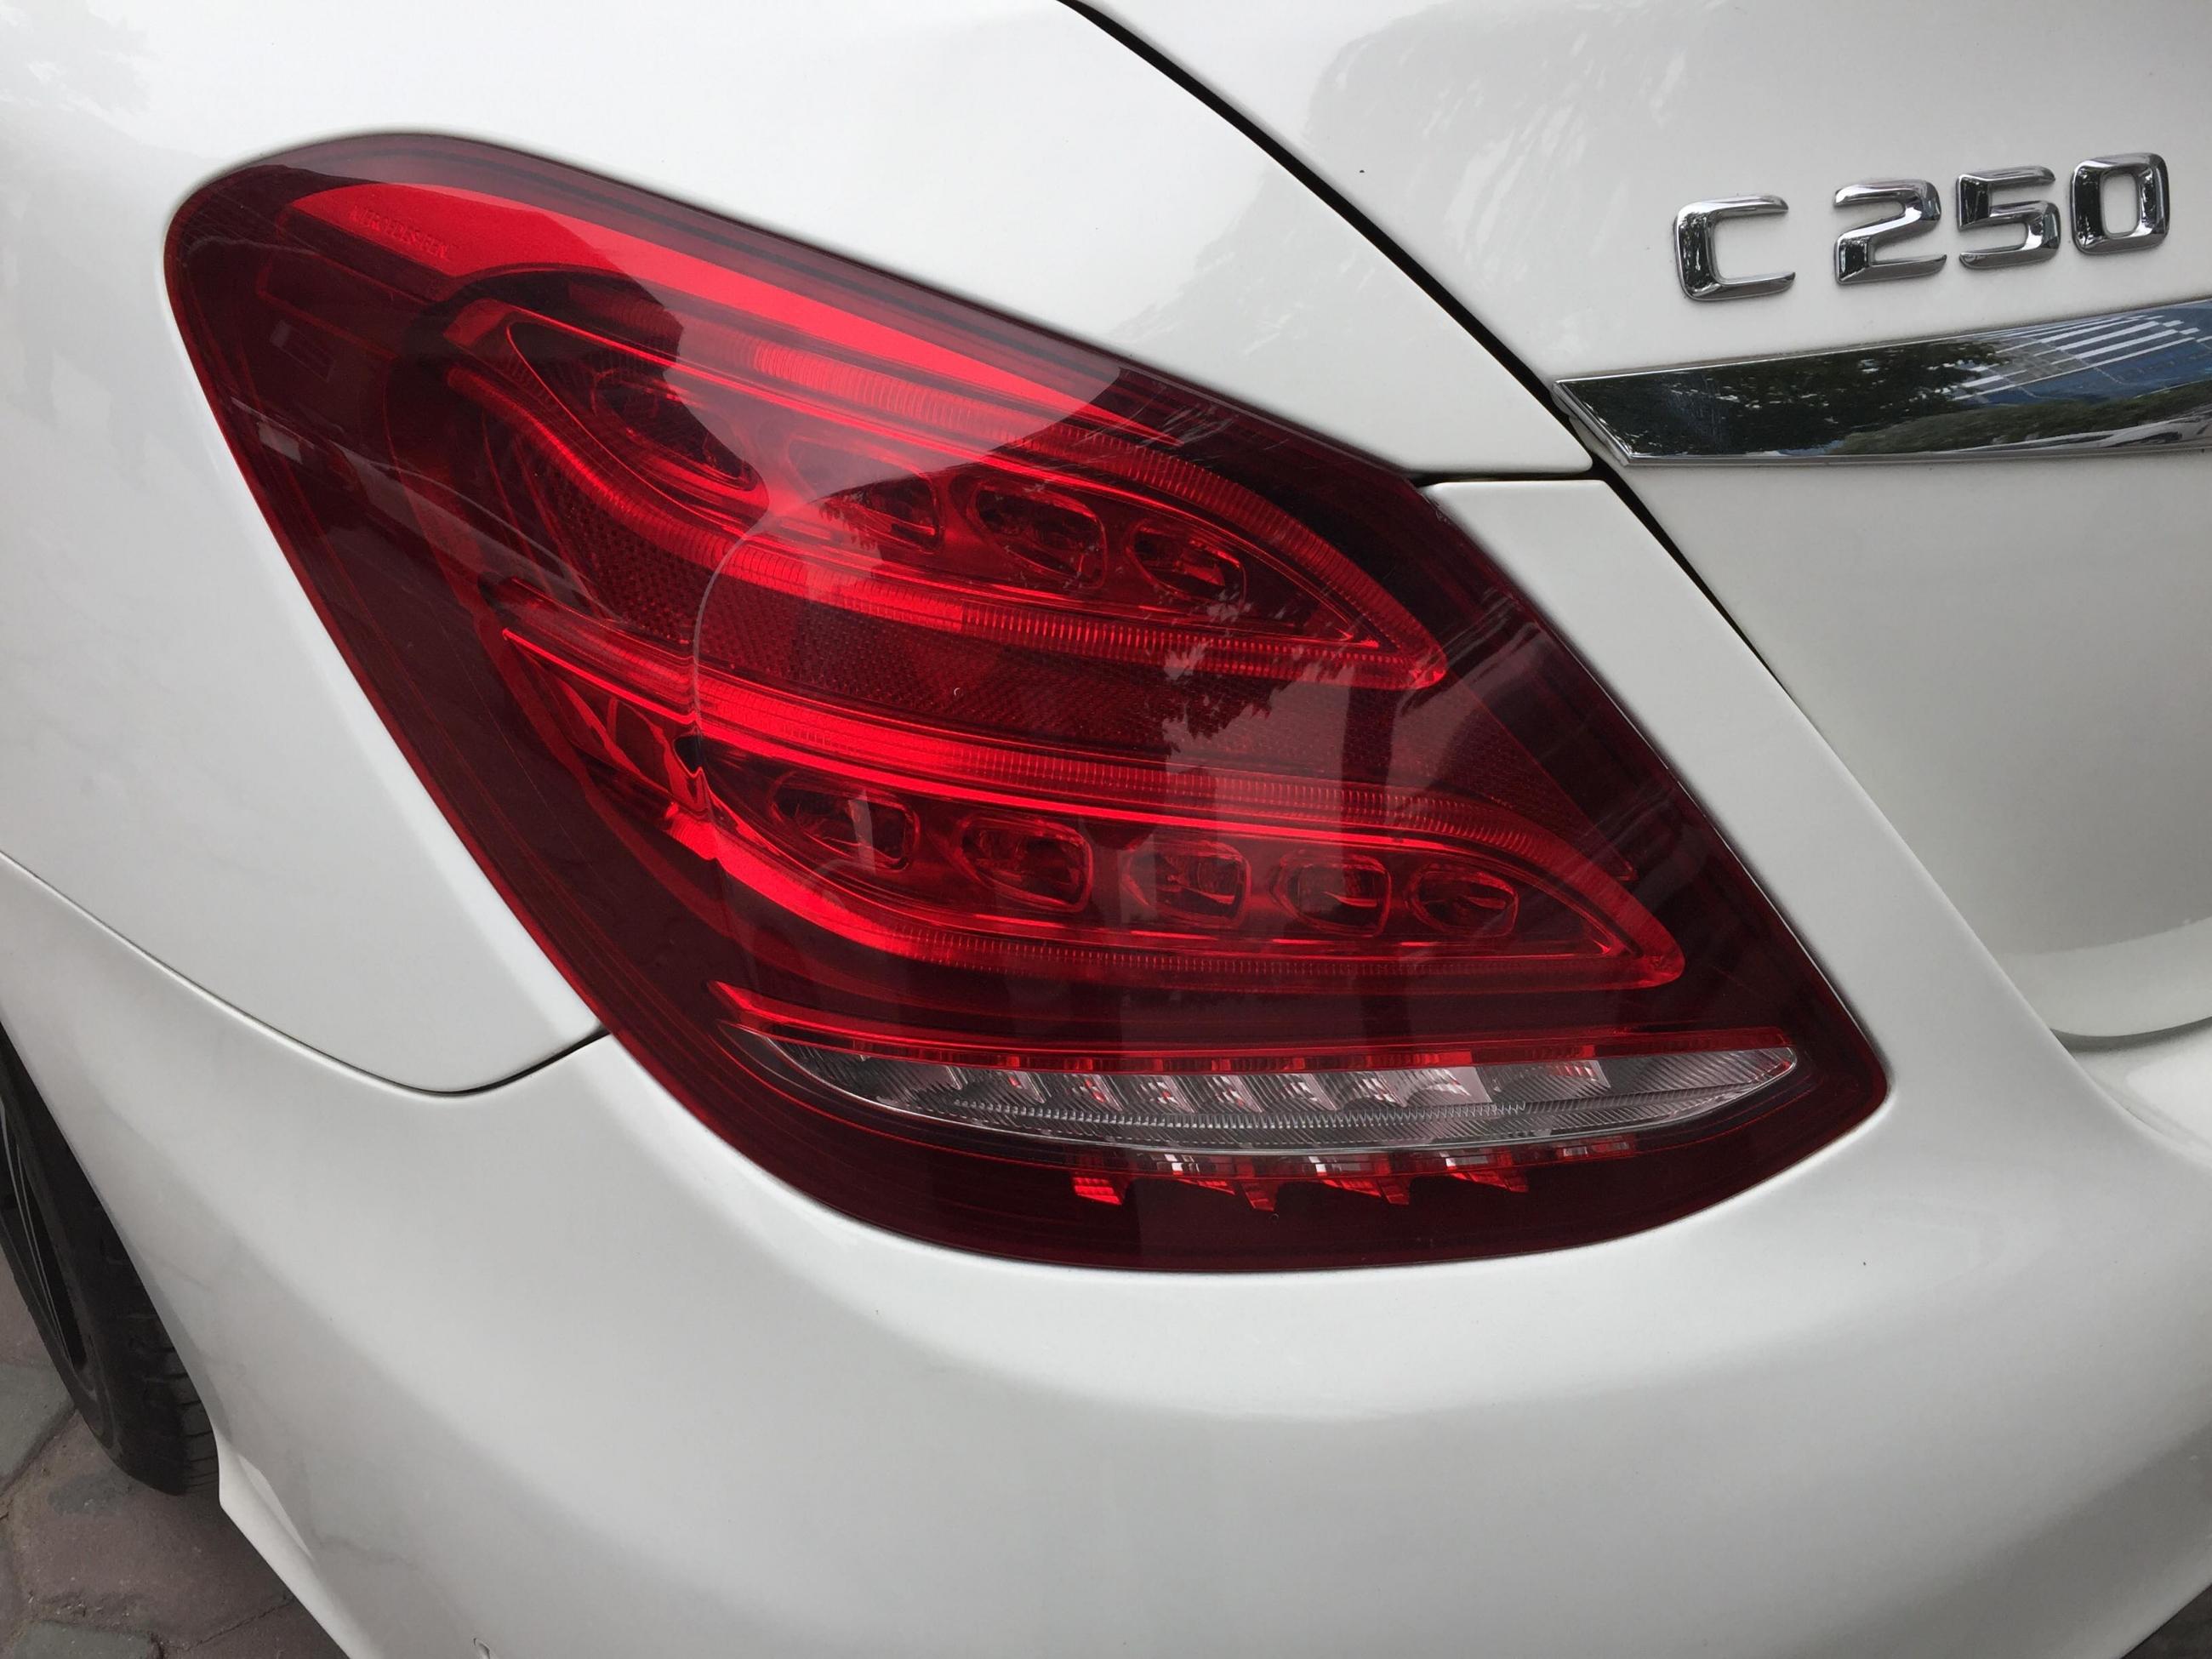 Mercedes Benz C250 AMG 2015 - 8